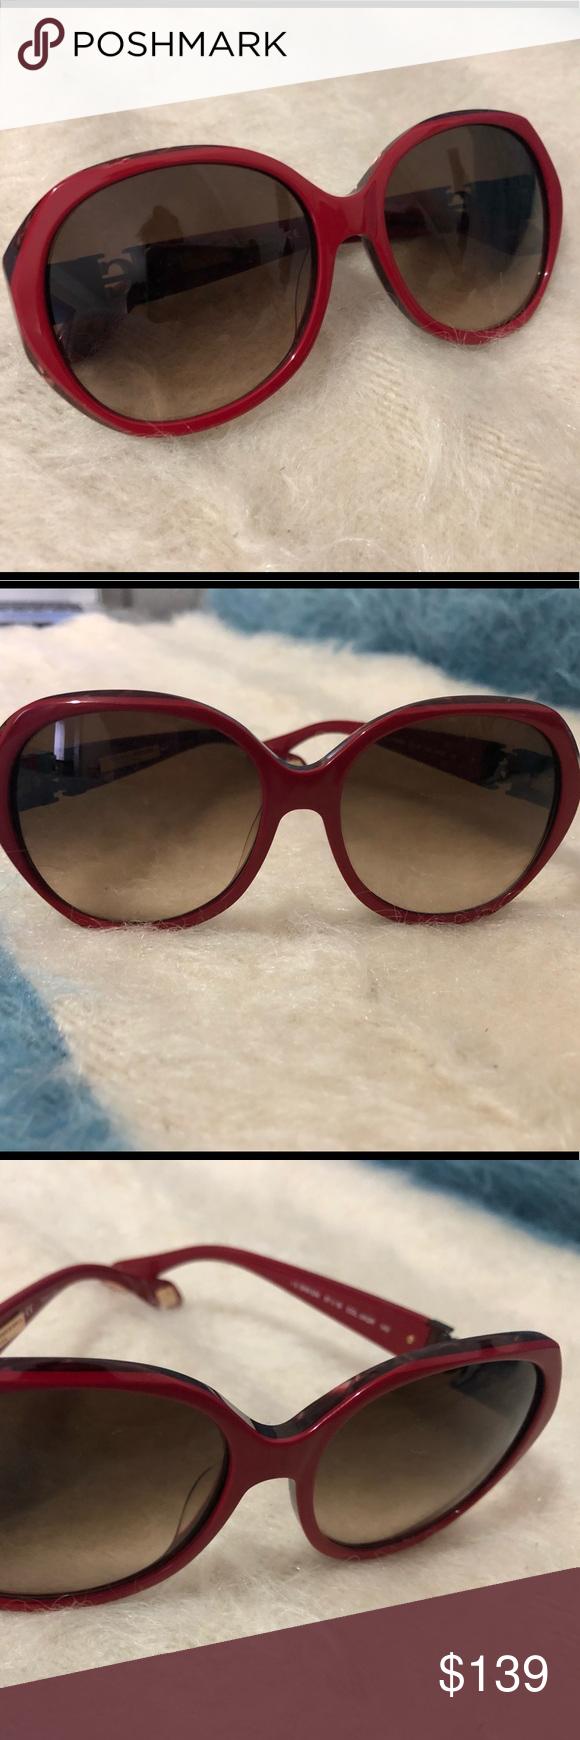 c7be13fb3a5d Carolina Herrera Sunglass Carolina Herrera Sunglass Carolina Herrera  Accessories Glasses